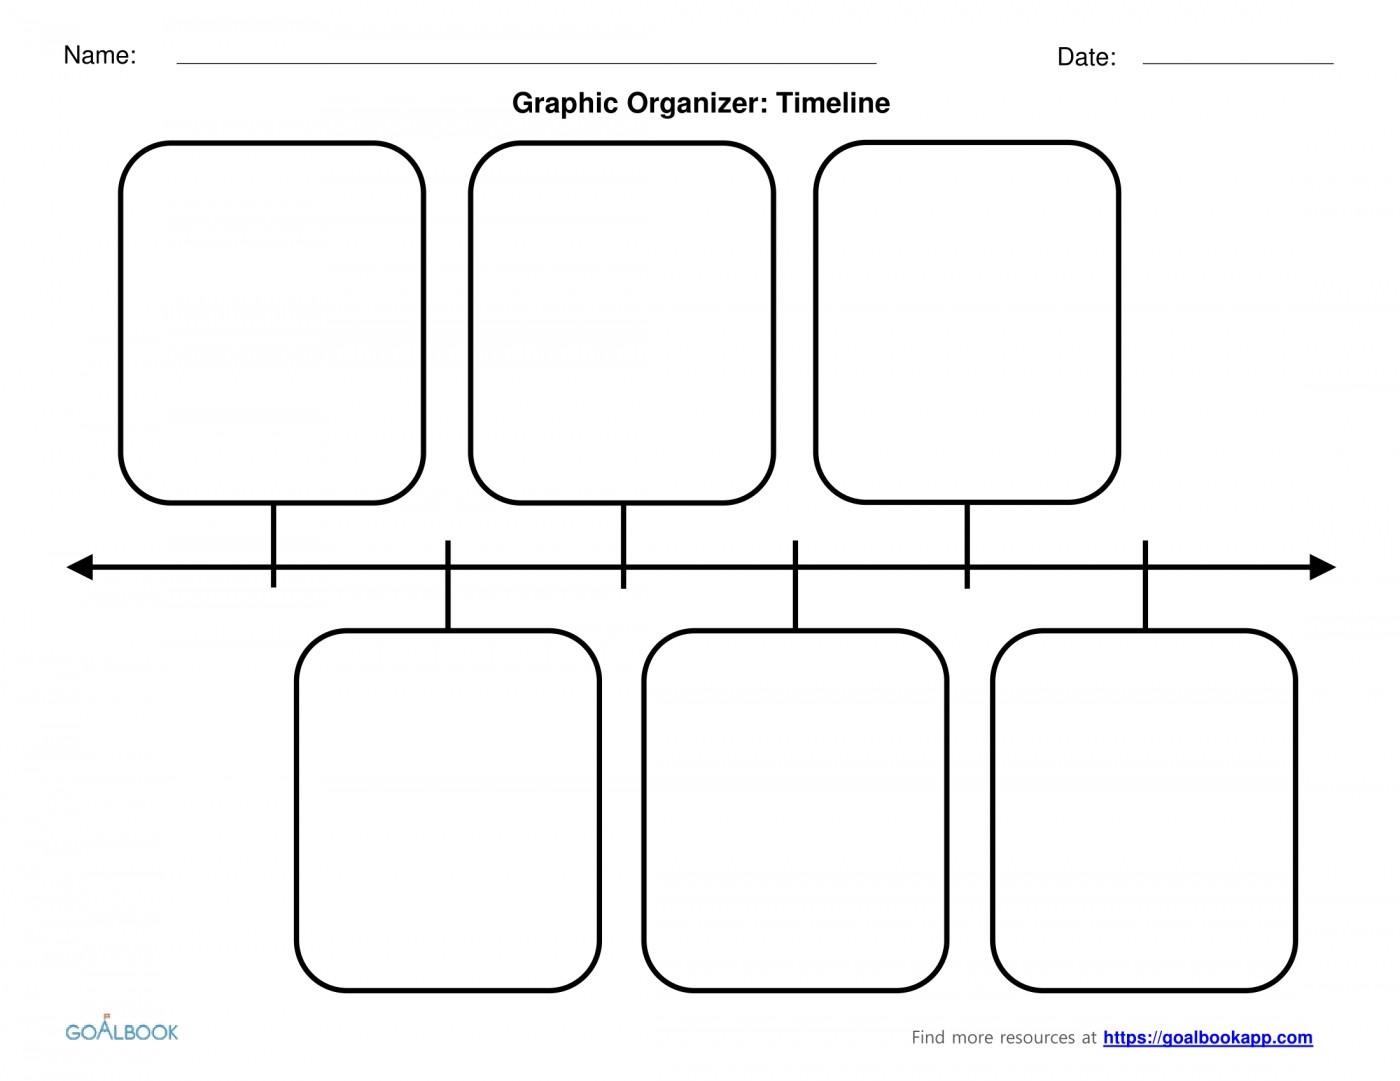 018 03 Timeline Blank Essay Example Five Paragraph Graphic Wonderful Organizer High School Definition 5 Pdf 1400